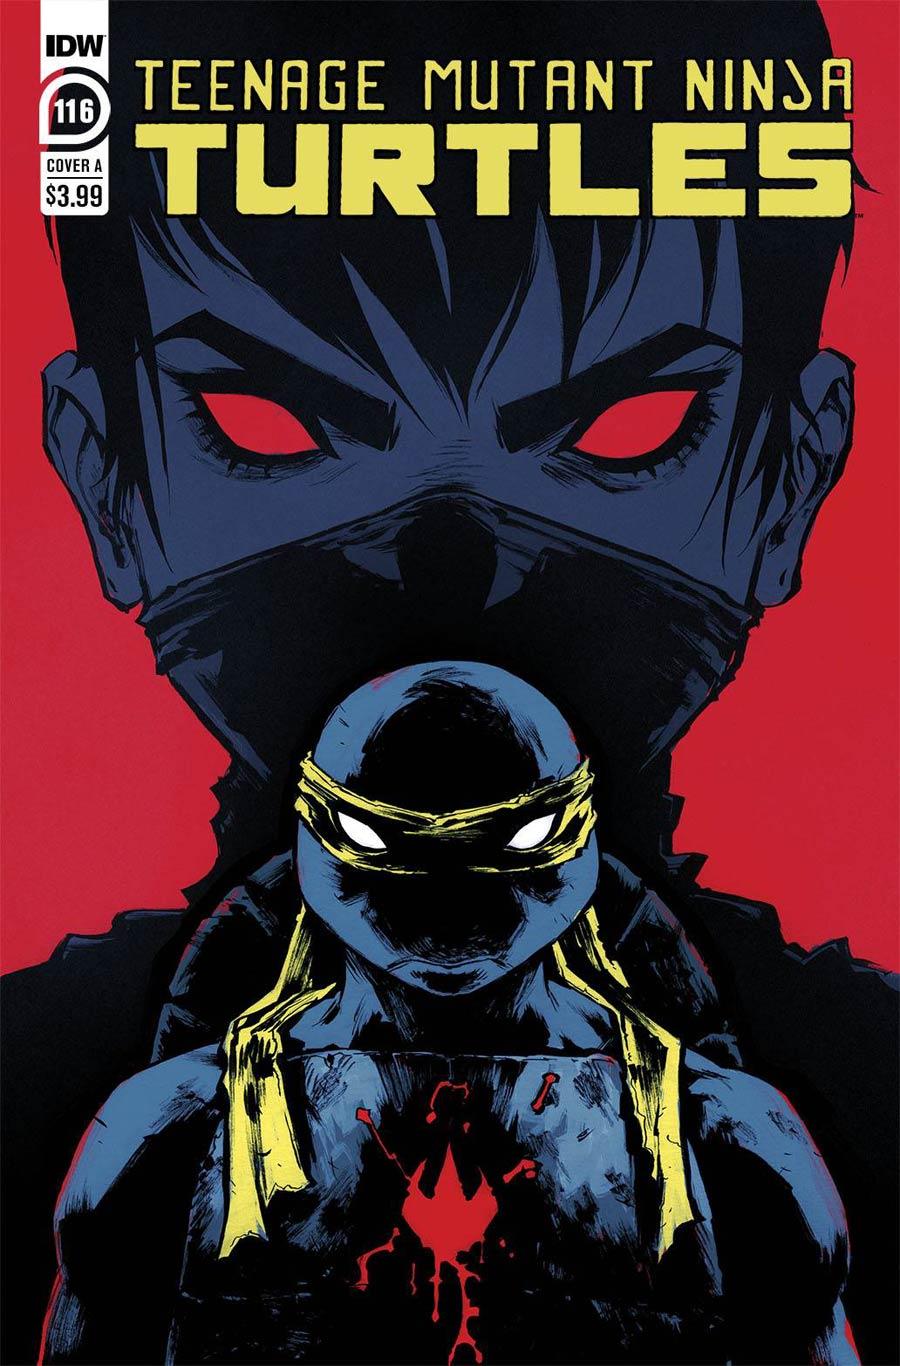 Teenage Mutant Ninja Turtles Vol 5 #116 Cover A Regular Sophie Campbell Cover